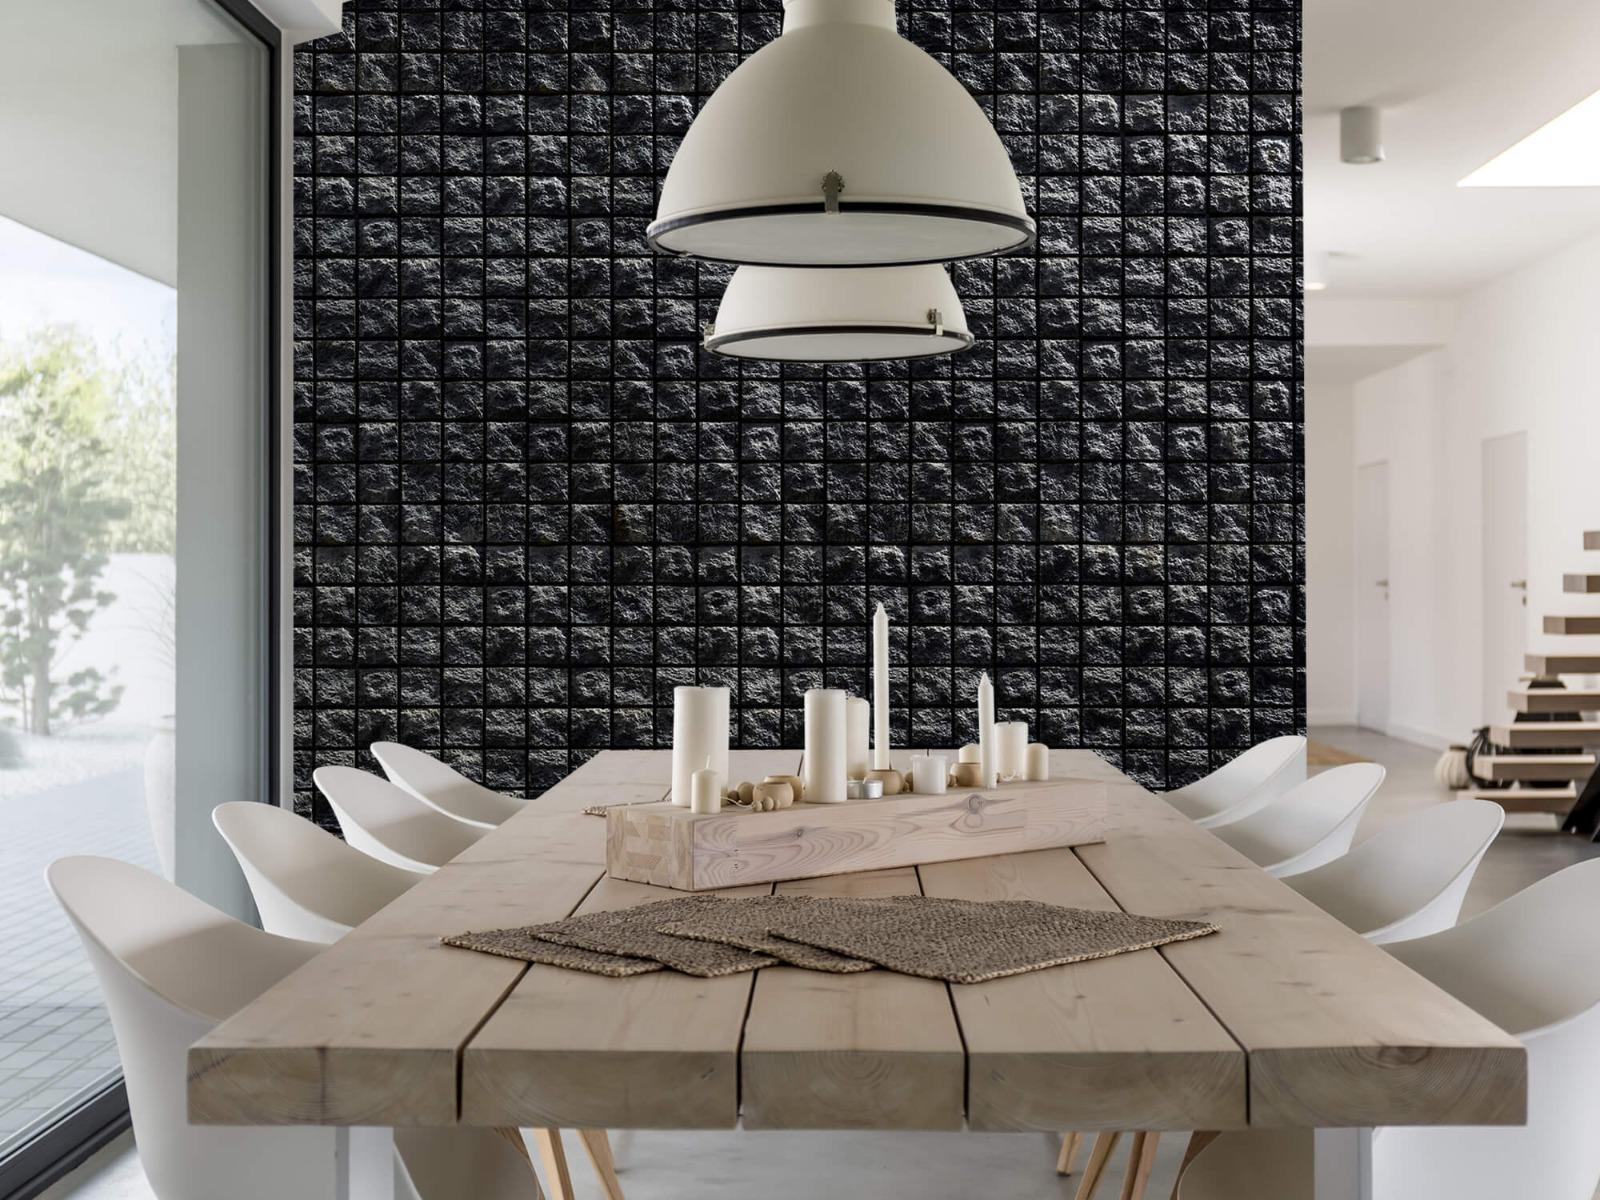 Tegel behang - Vierkante zwarte stenen - Wallexclusive - Woonkamer 1